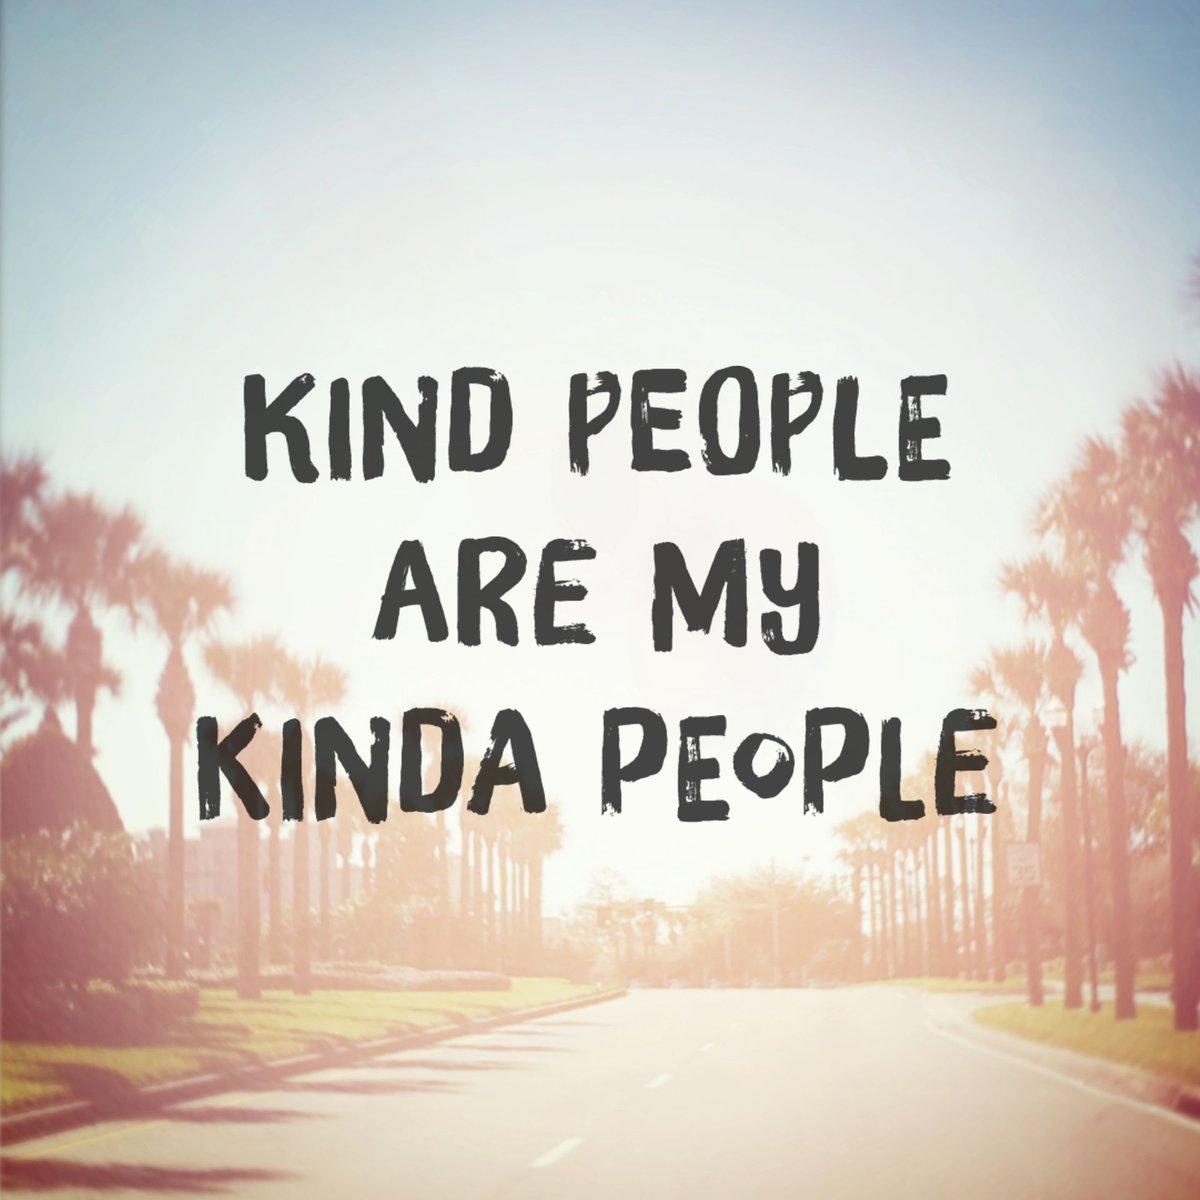 Kindness is beautiful.